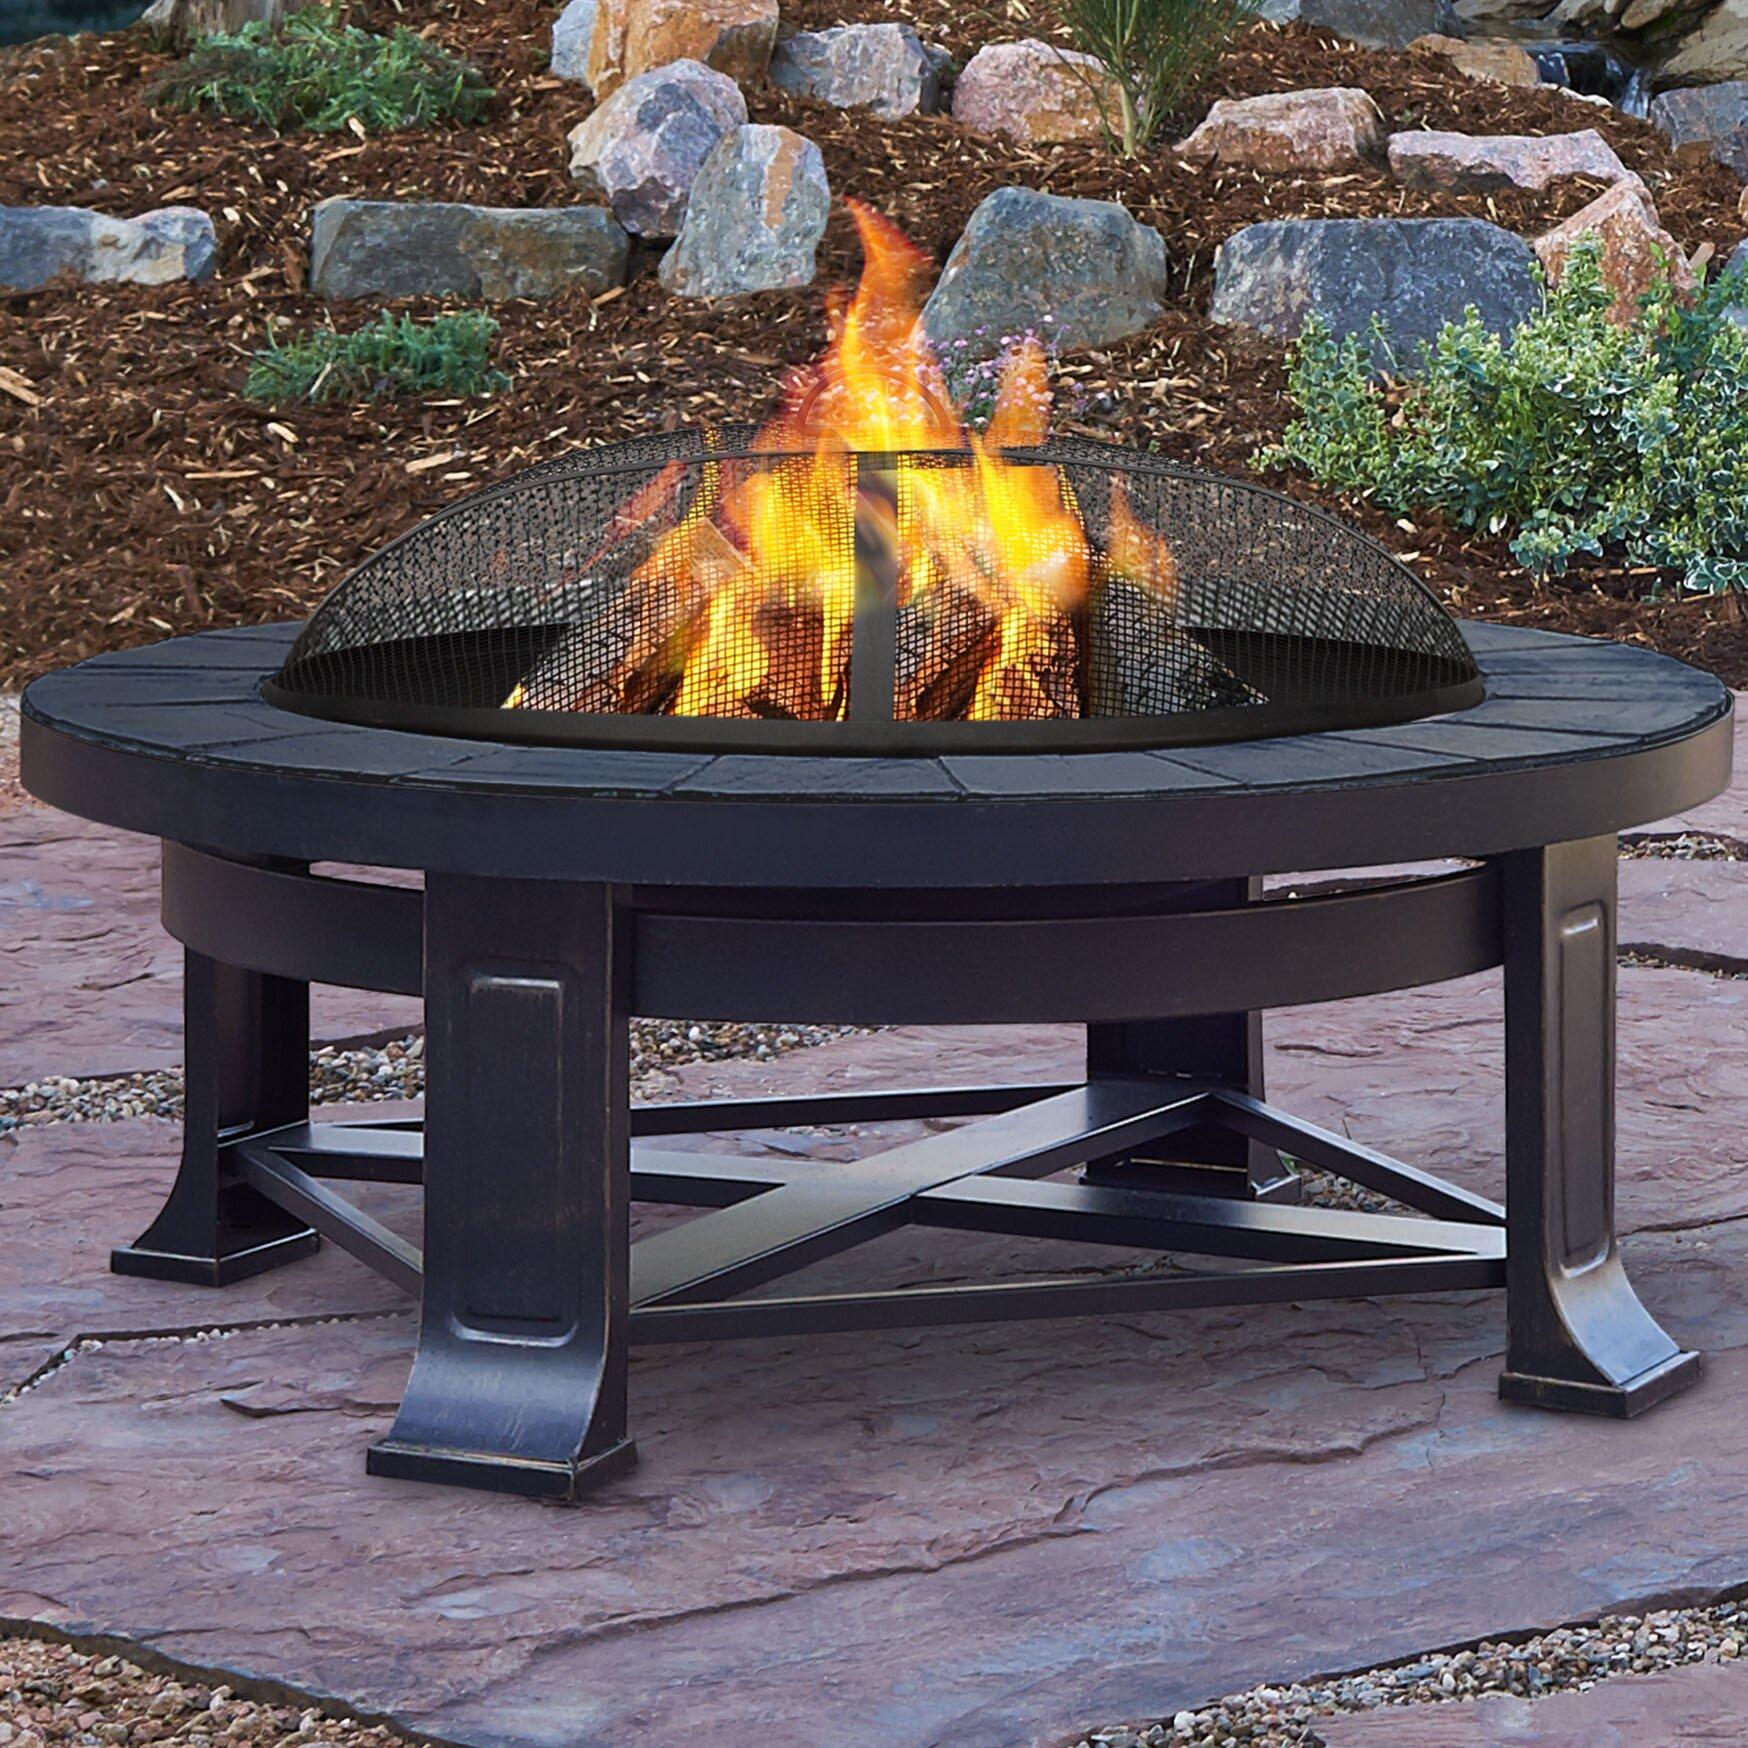 Real Flame Steel Wood Burning Fire pit & Reviews | Wayfair.ca